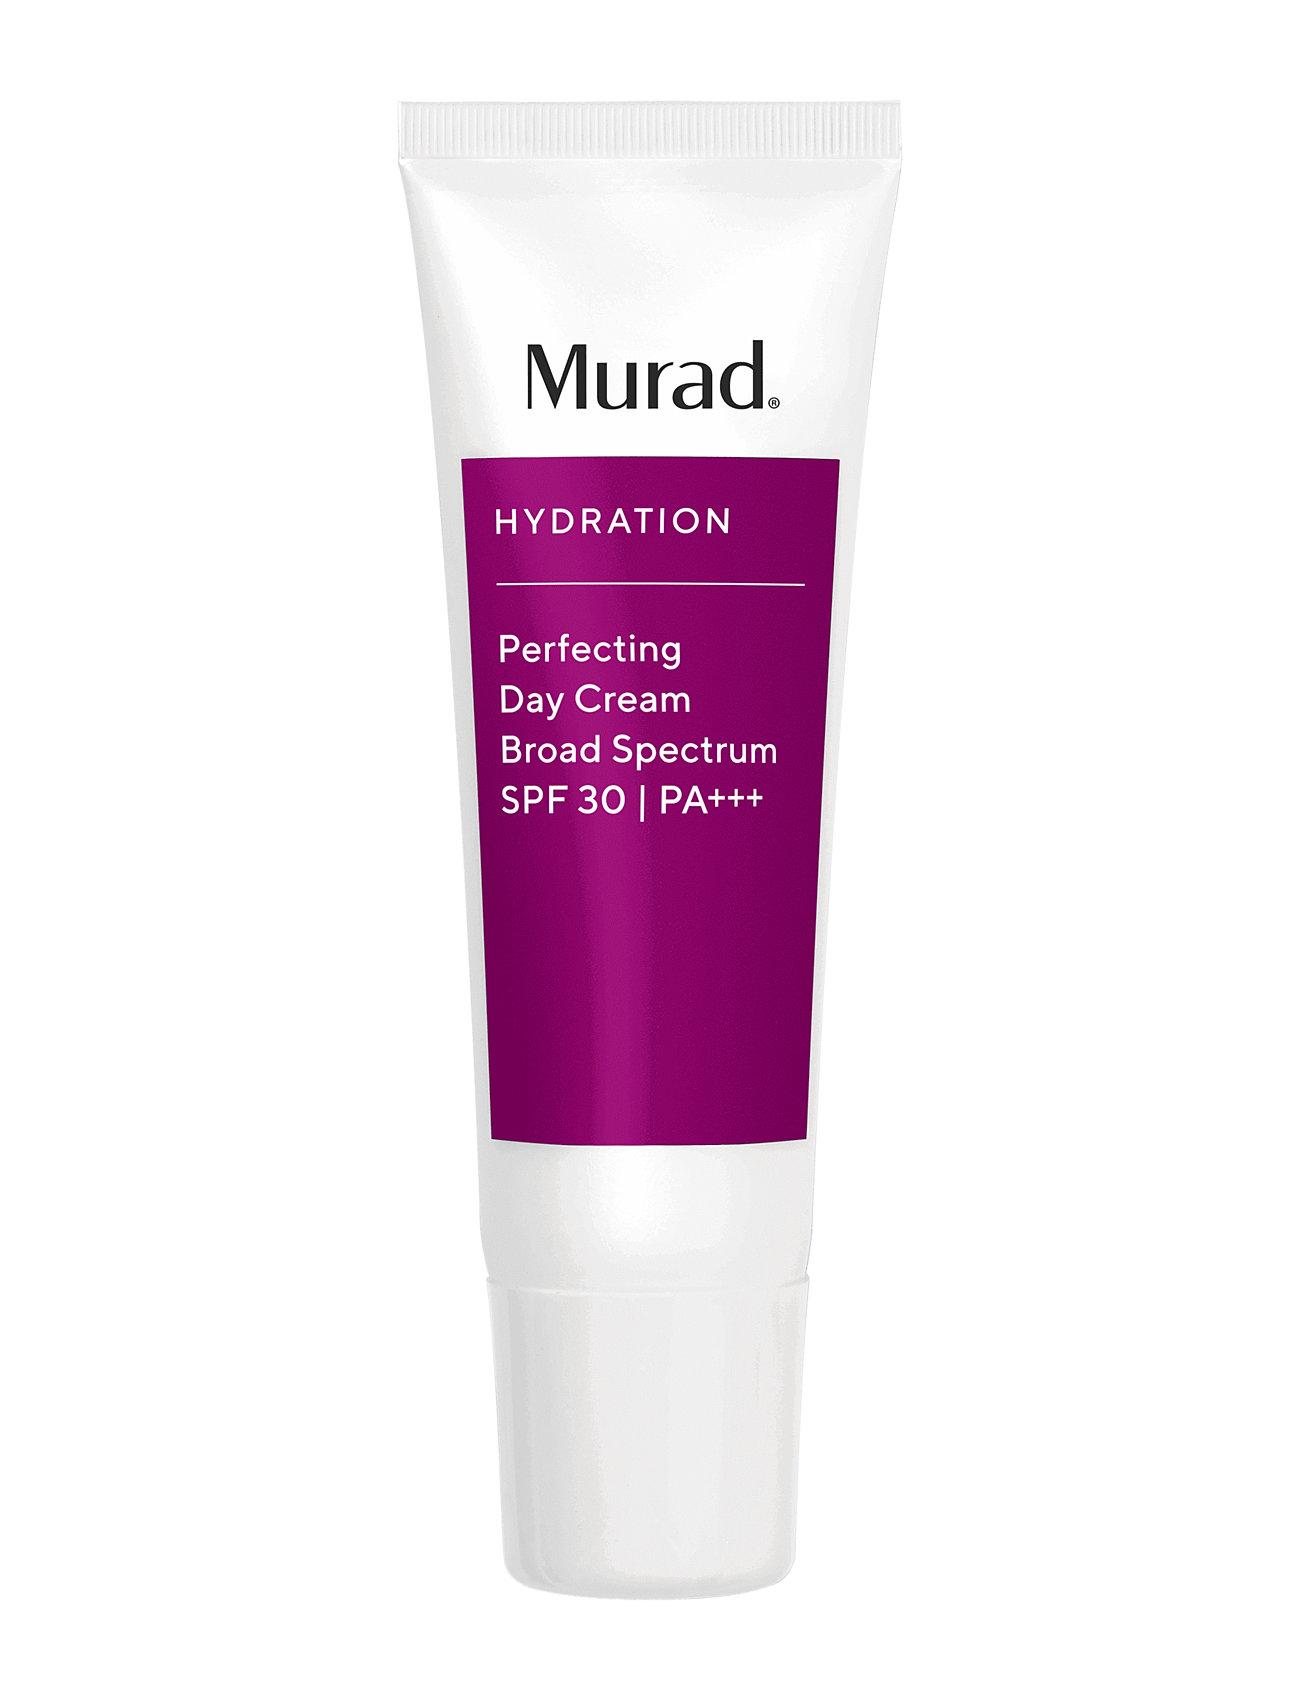 Murad Hydration Perfecting Day Cream Broad Spectrum SPF 30 - NO COLOUR